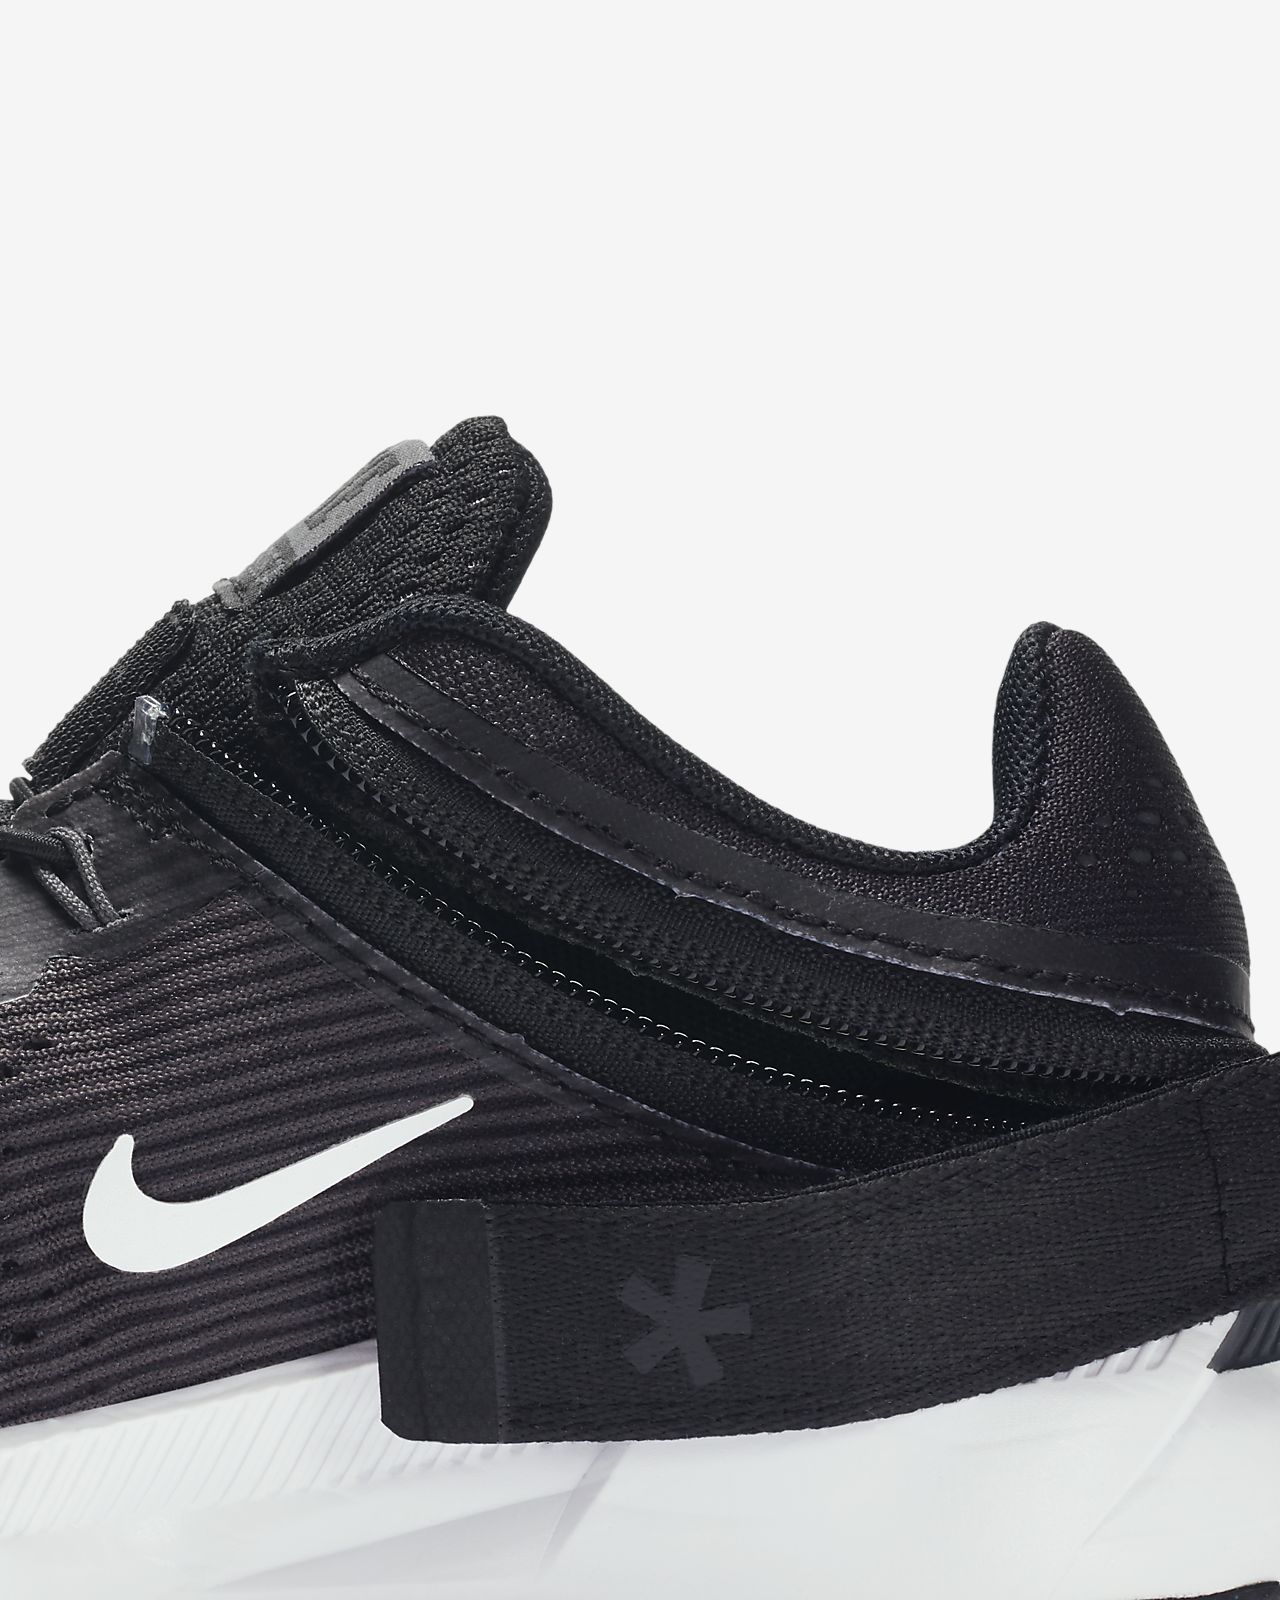 los angeles 689a5 20a12 Nike Zoom Pegasus 34 FlyEase Little/Big Kids' Running Shoe